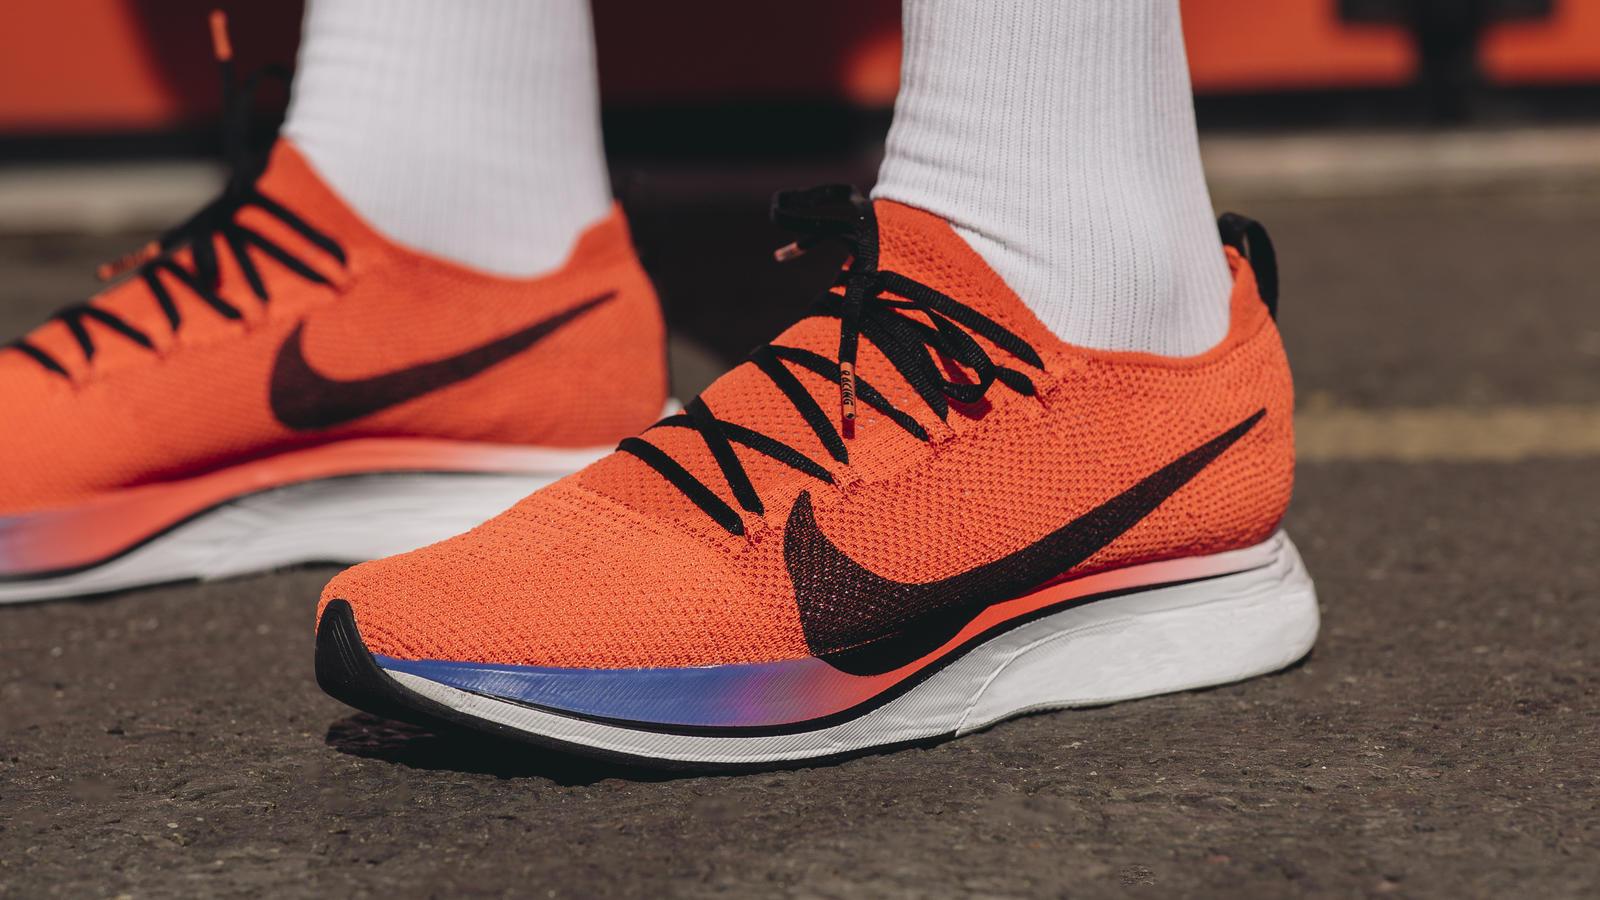 Nike Vaporfly 4% Flyknit London Marathon